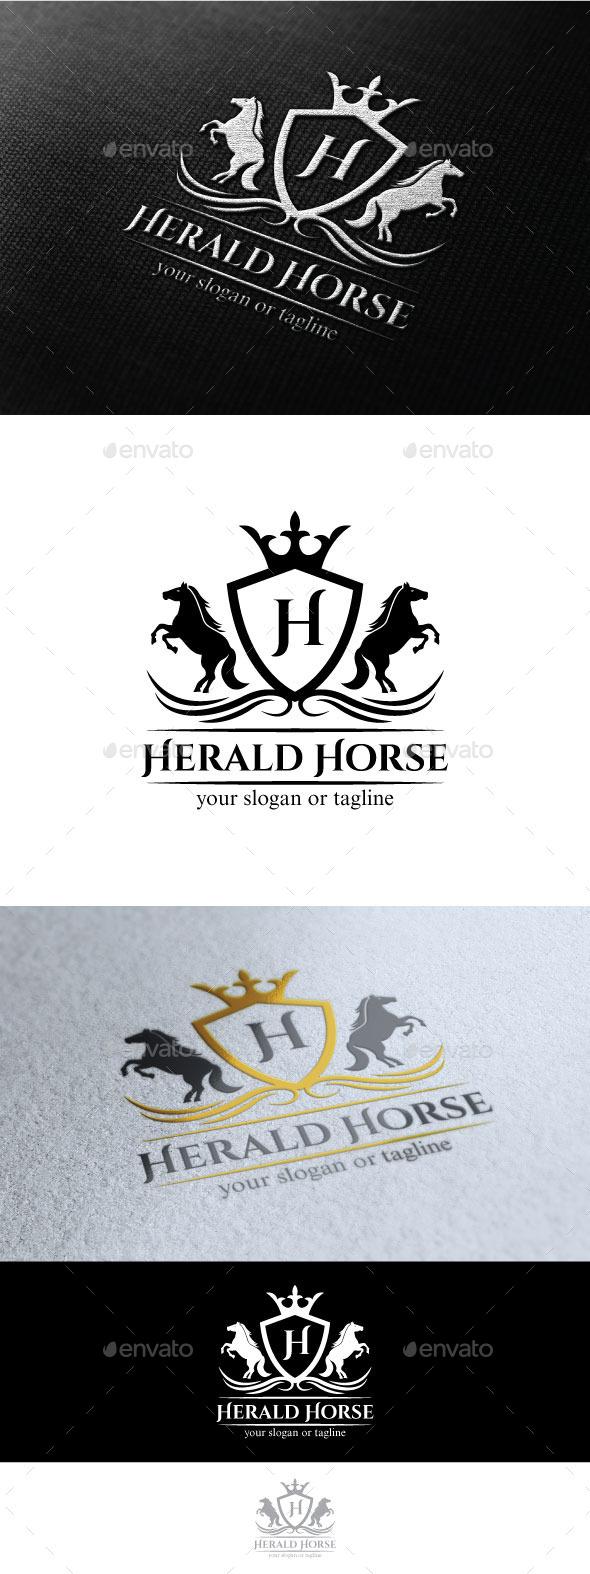 Horse Herald - Crests Logo Templates